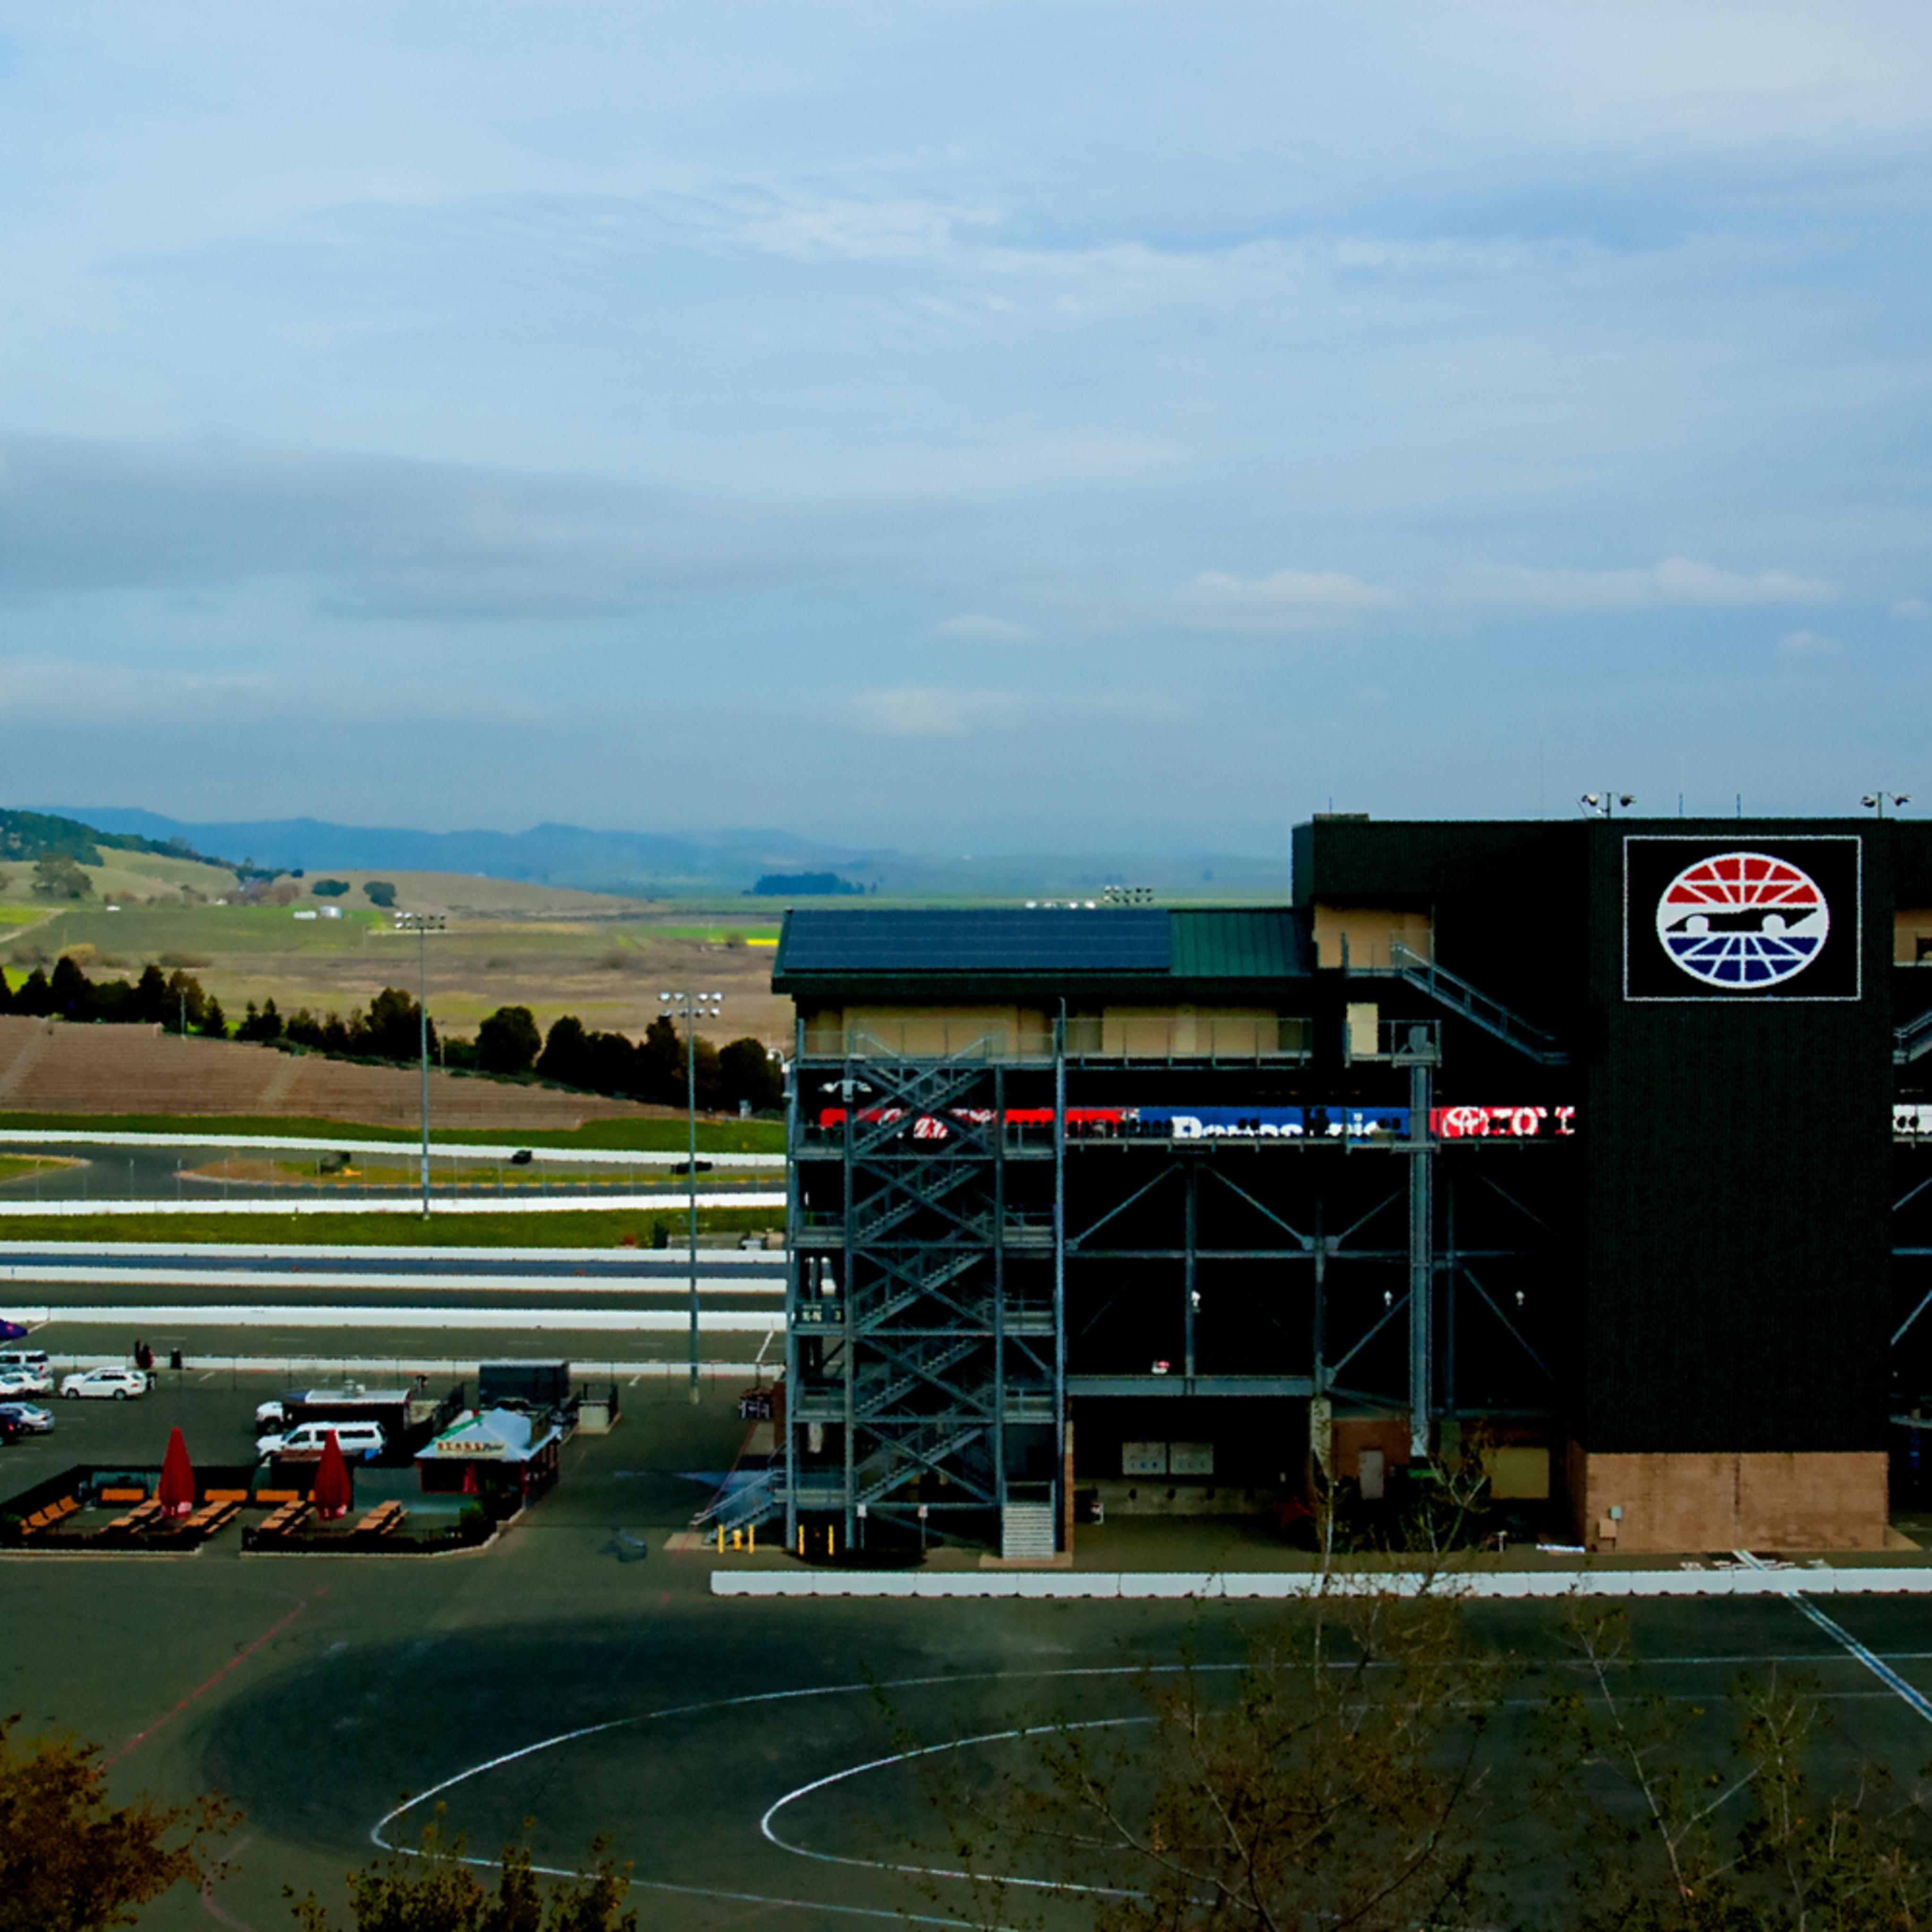 Sonoma raceway 2 hrlobue kk0hsw